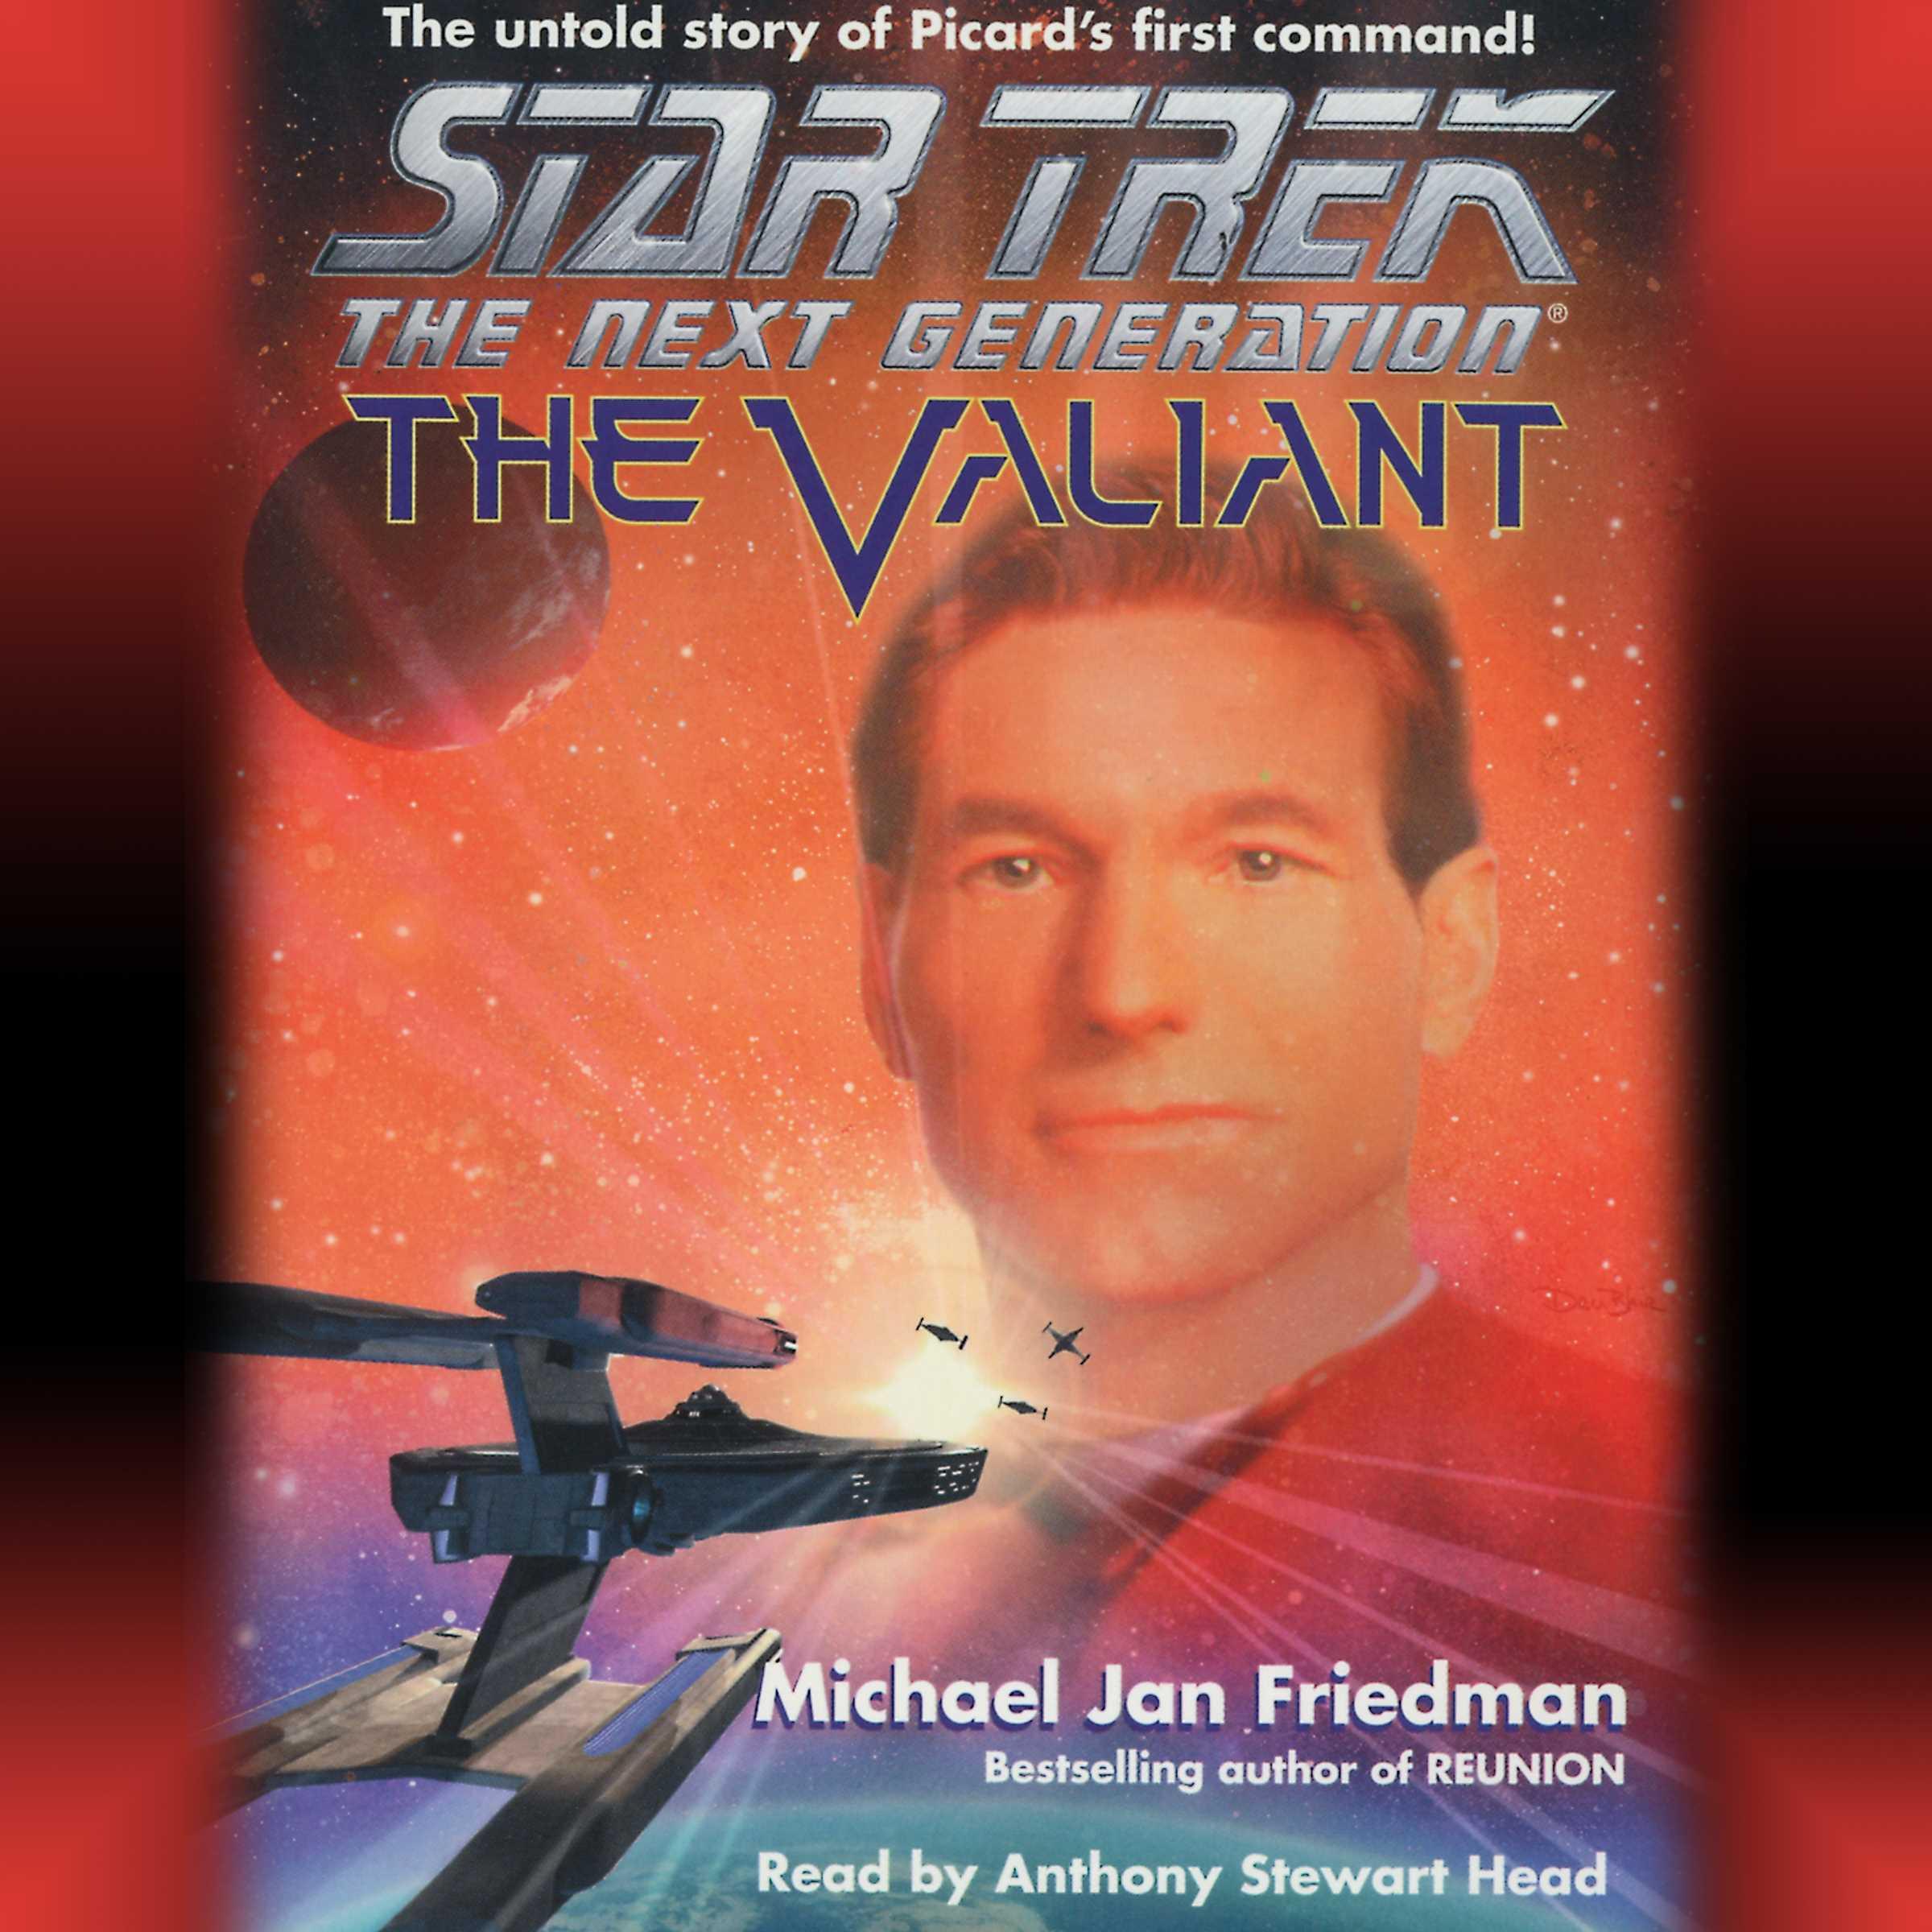 Star trek the next generation the valiant 9780743519595 hr